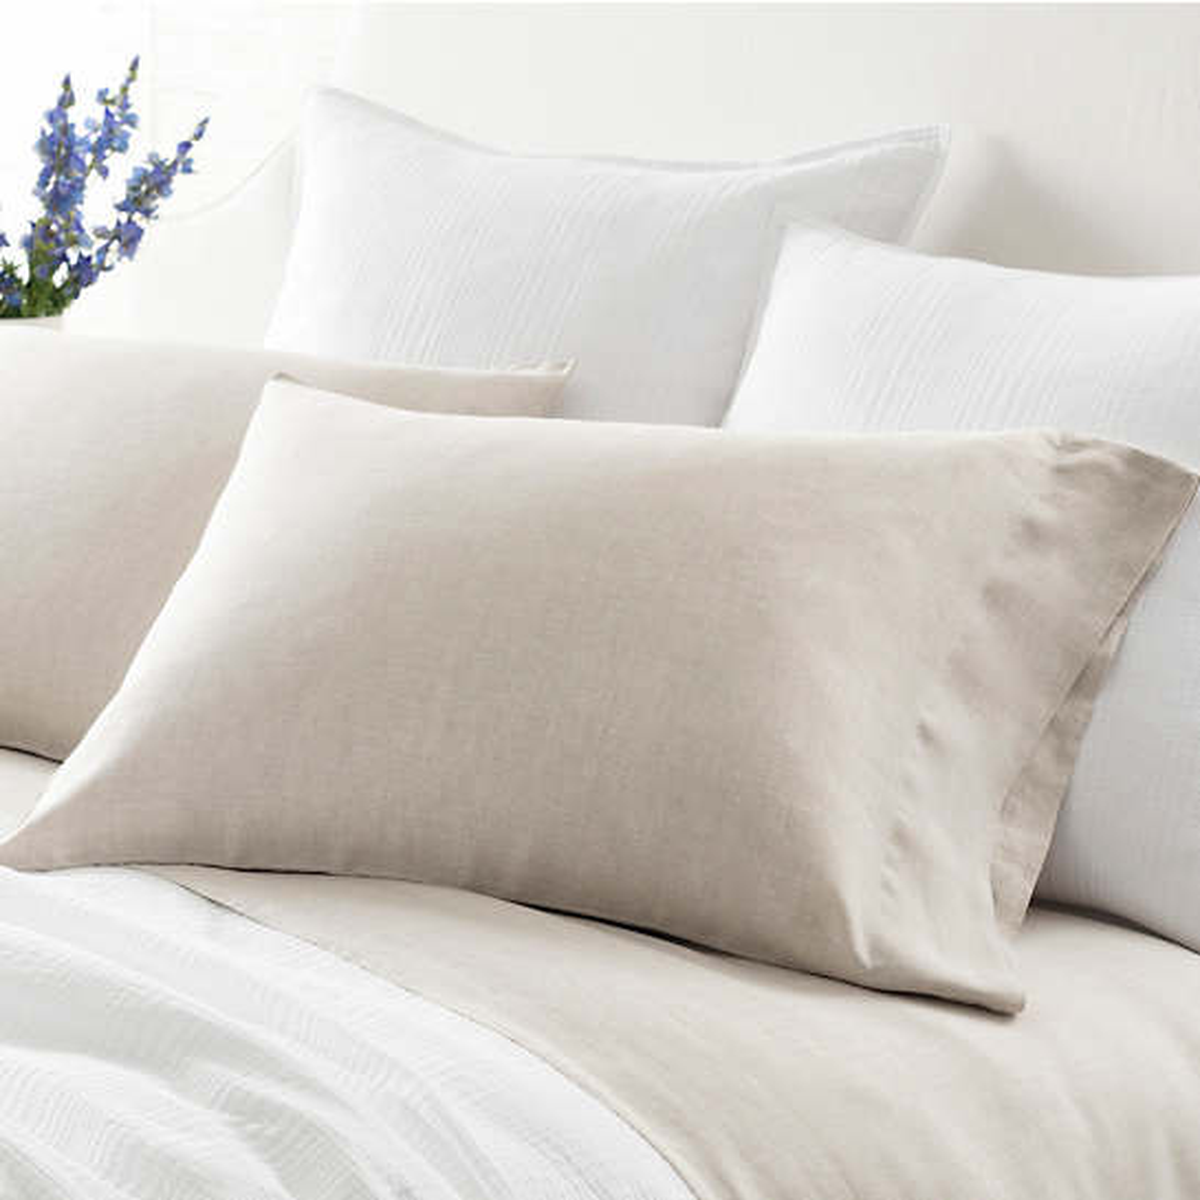 Lush Linen Natural Pillowcases